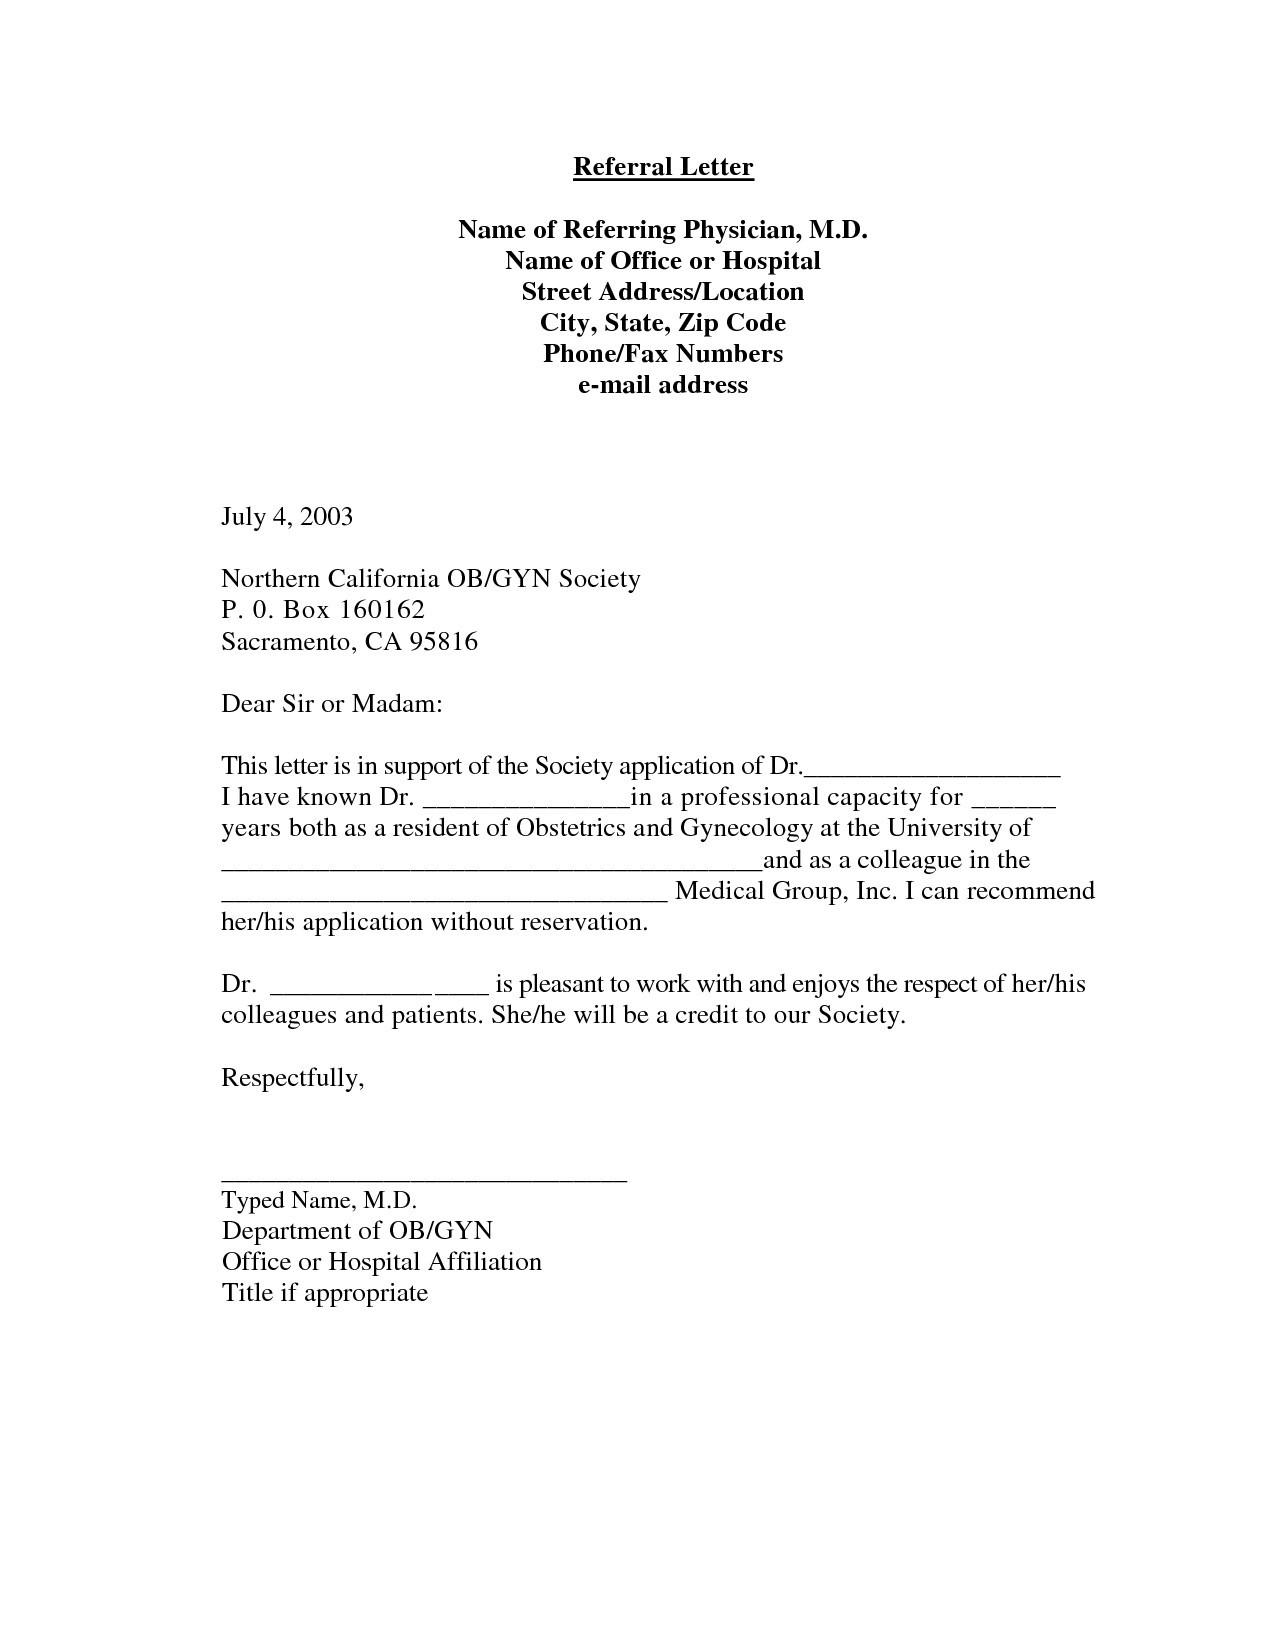 Medical Referral Letter Template - Re Mendation Letter Template Medical 2018 Re Mendation Letter